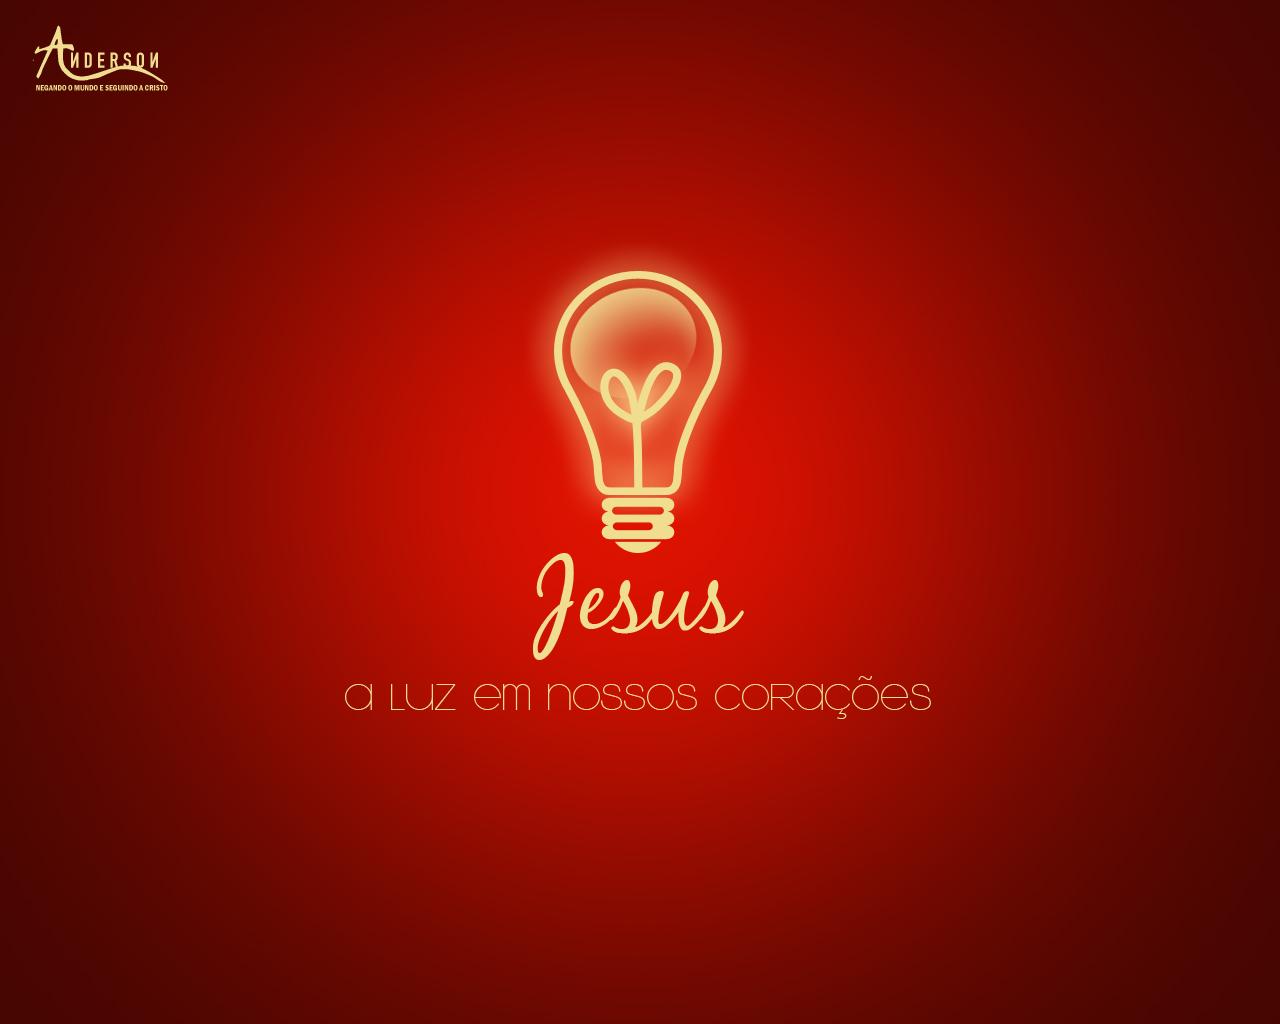 http://1.bp.blogspot.com/-C18DMGBWEF0/T0-BqAdL7BI/AAAAAAAAAH0/fdW4KzKatJw/s1600/6_wallpaper-jesus-a-luz-em-nossos-coracoes.jpg